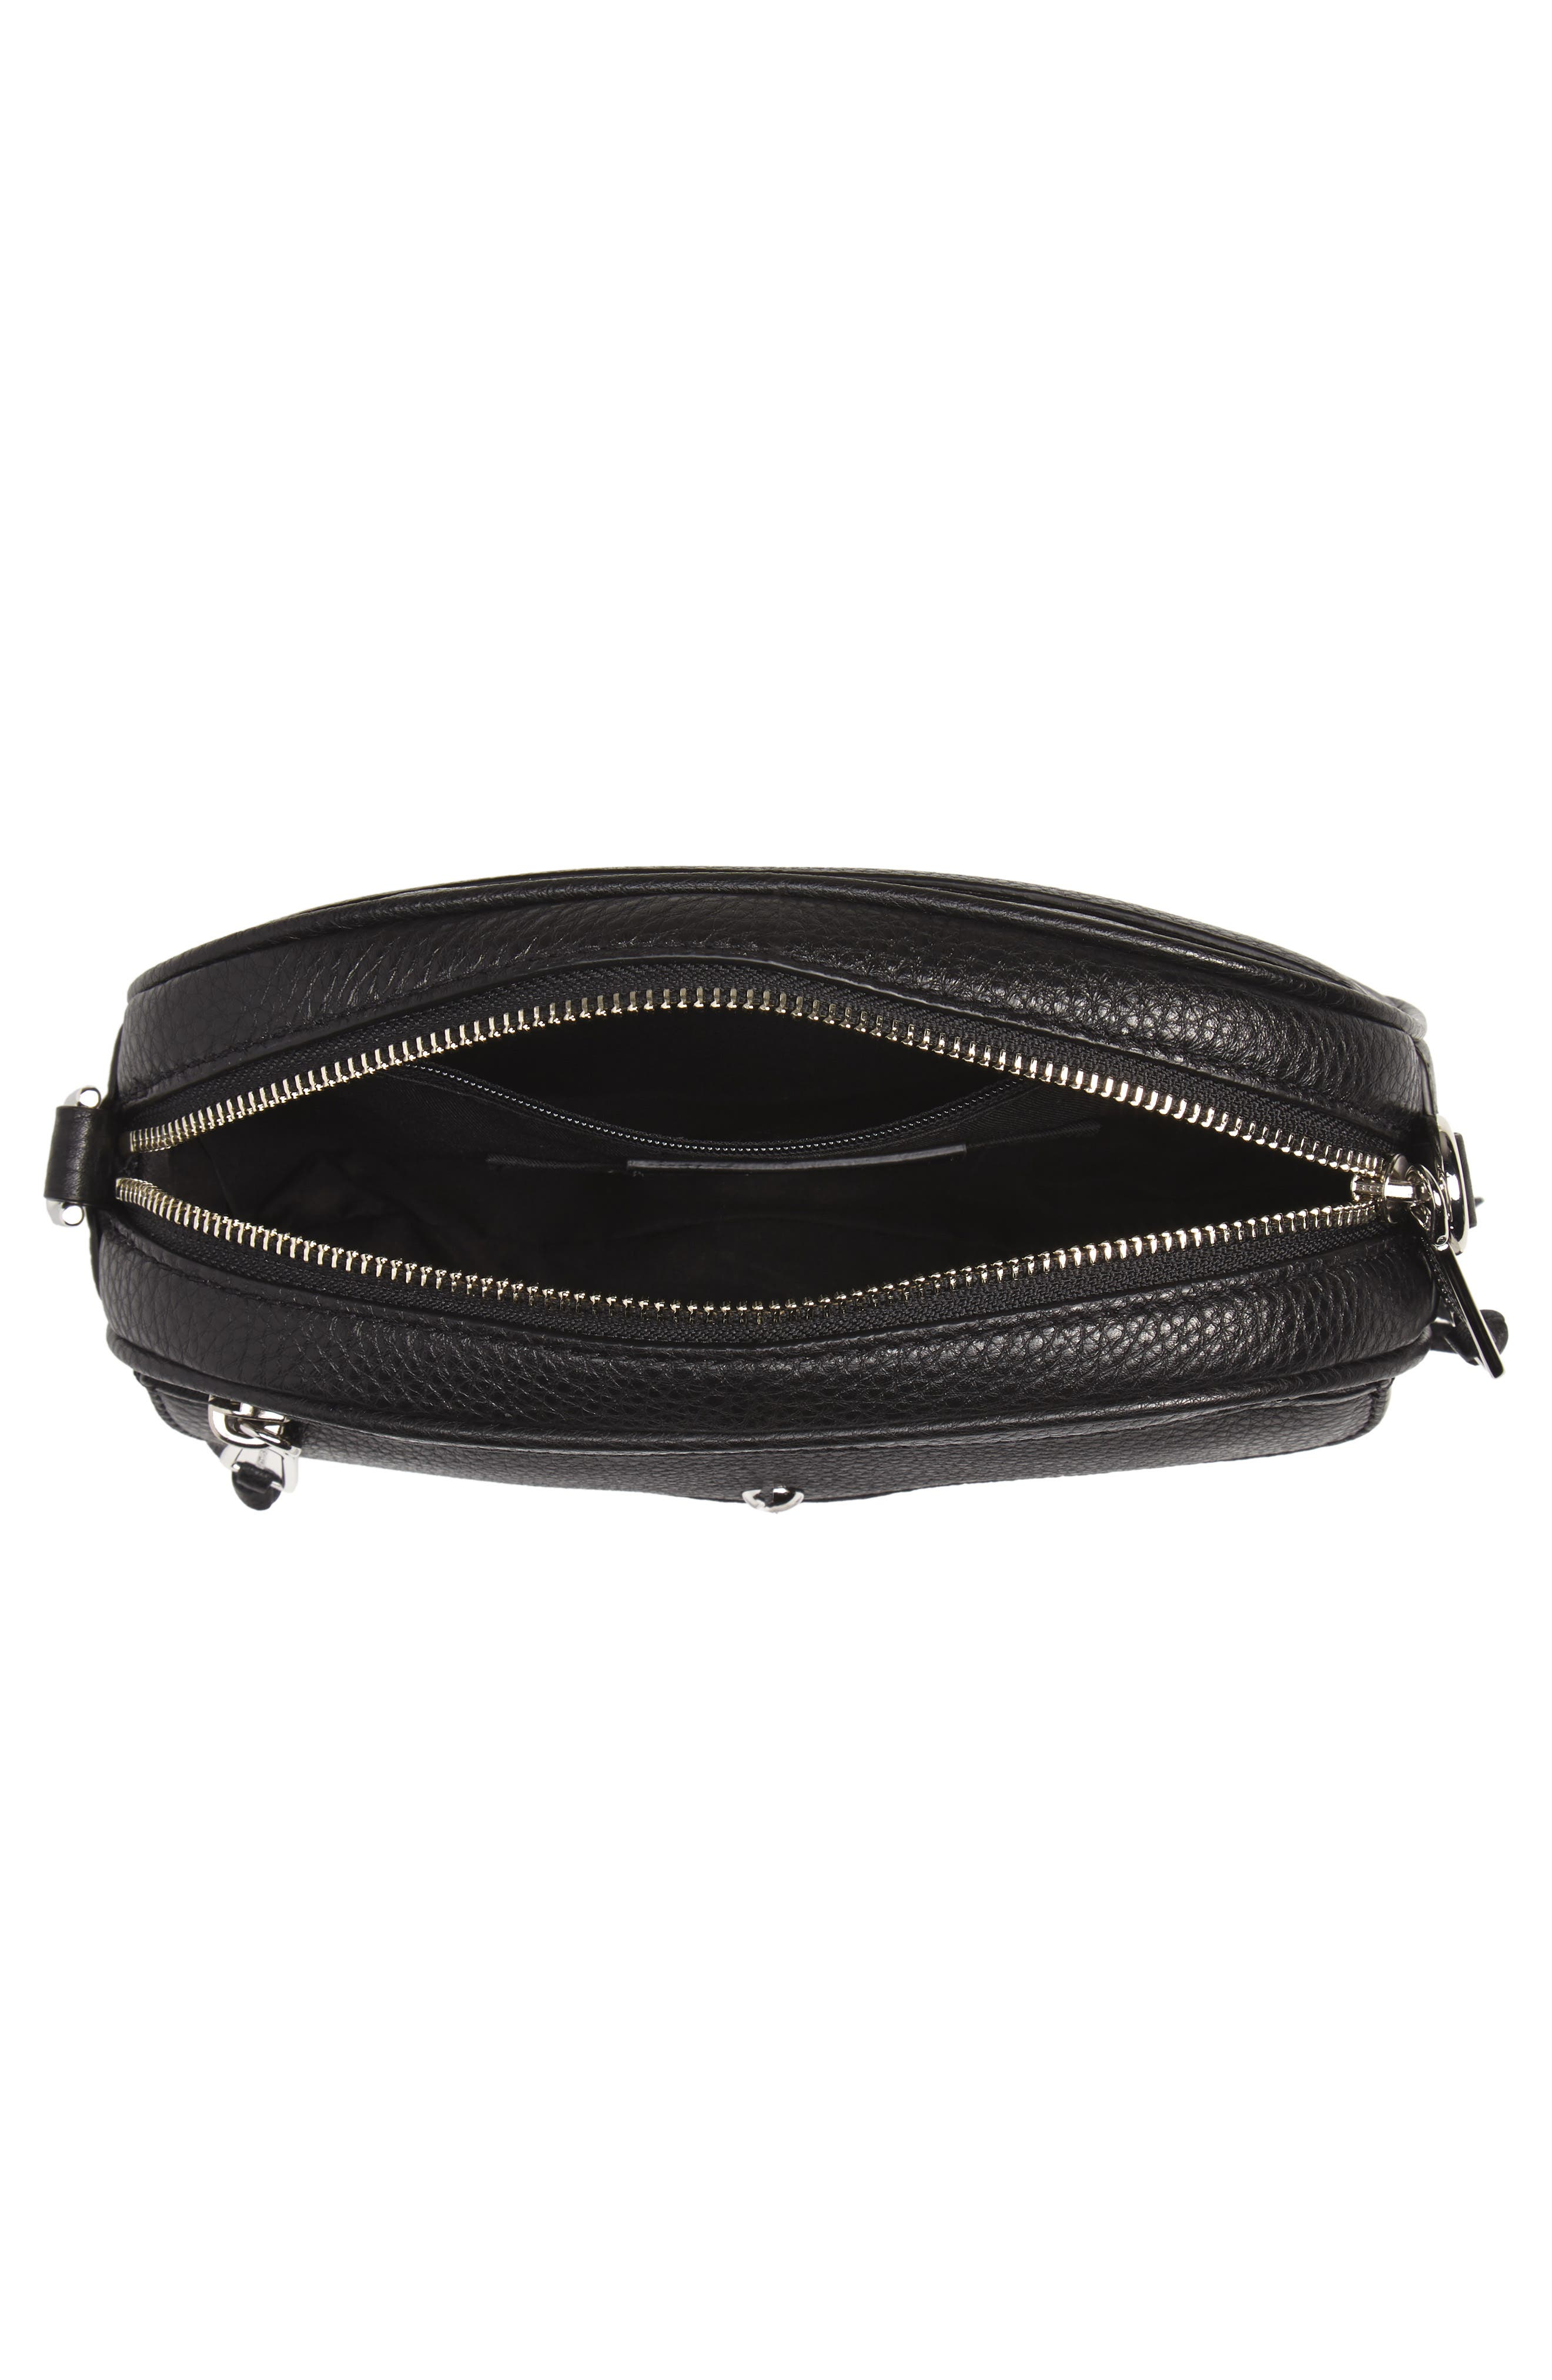 REBECCA MINKOFF,                             Blythe Leather Crossbody Bag,                             Alternate thumbnail 4, color,                             BLACK